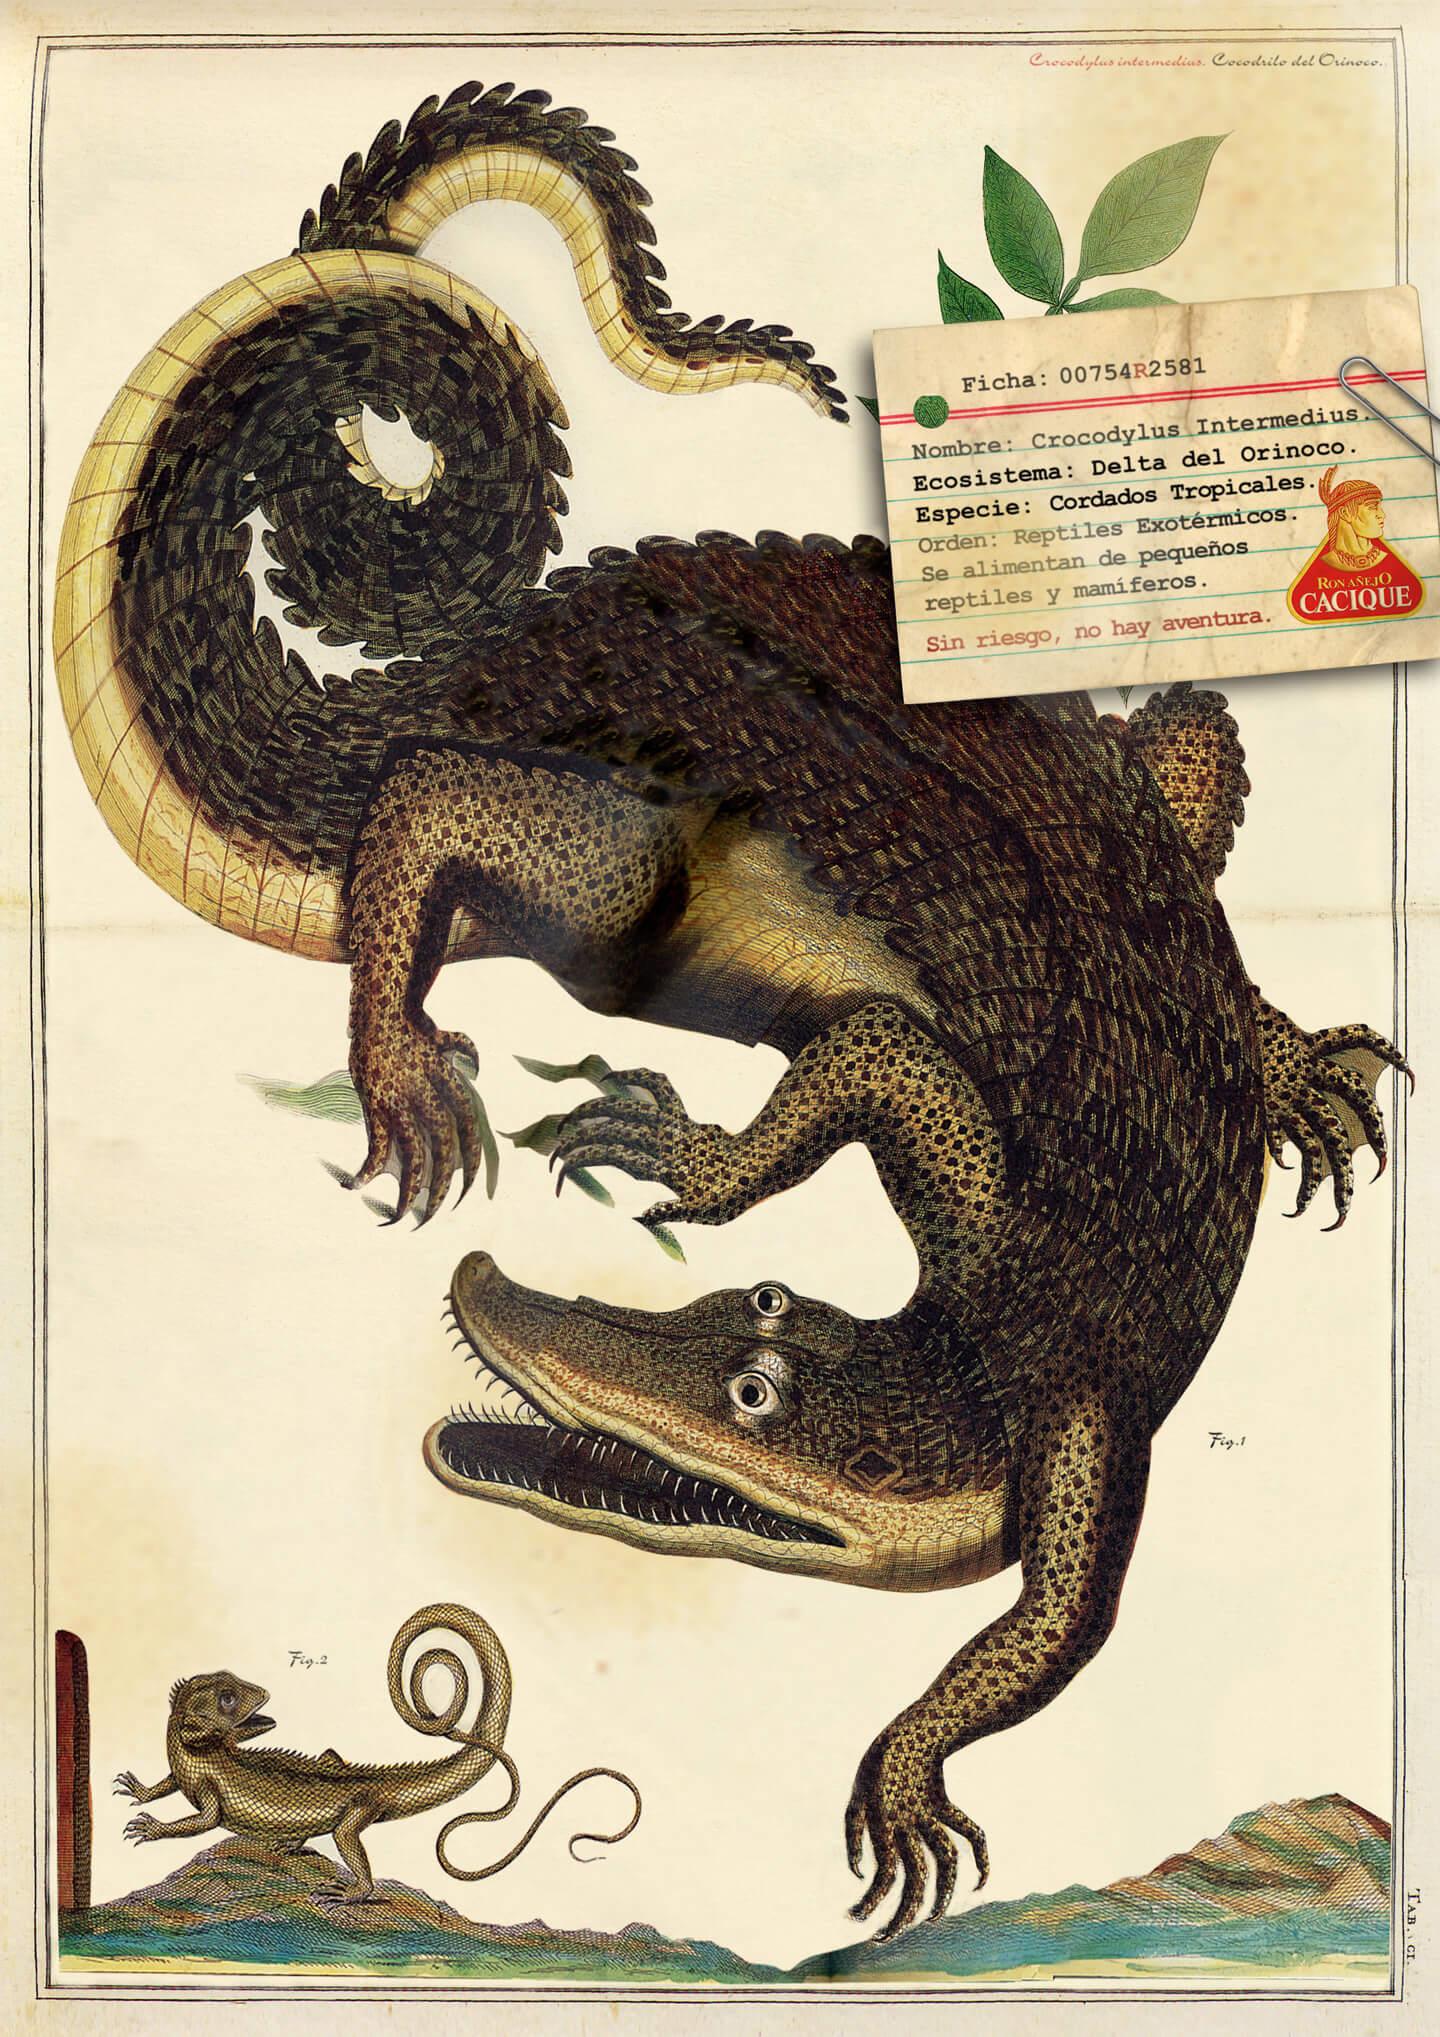 004-cacique-cocodrilo